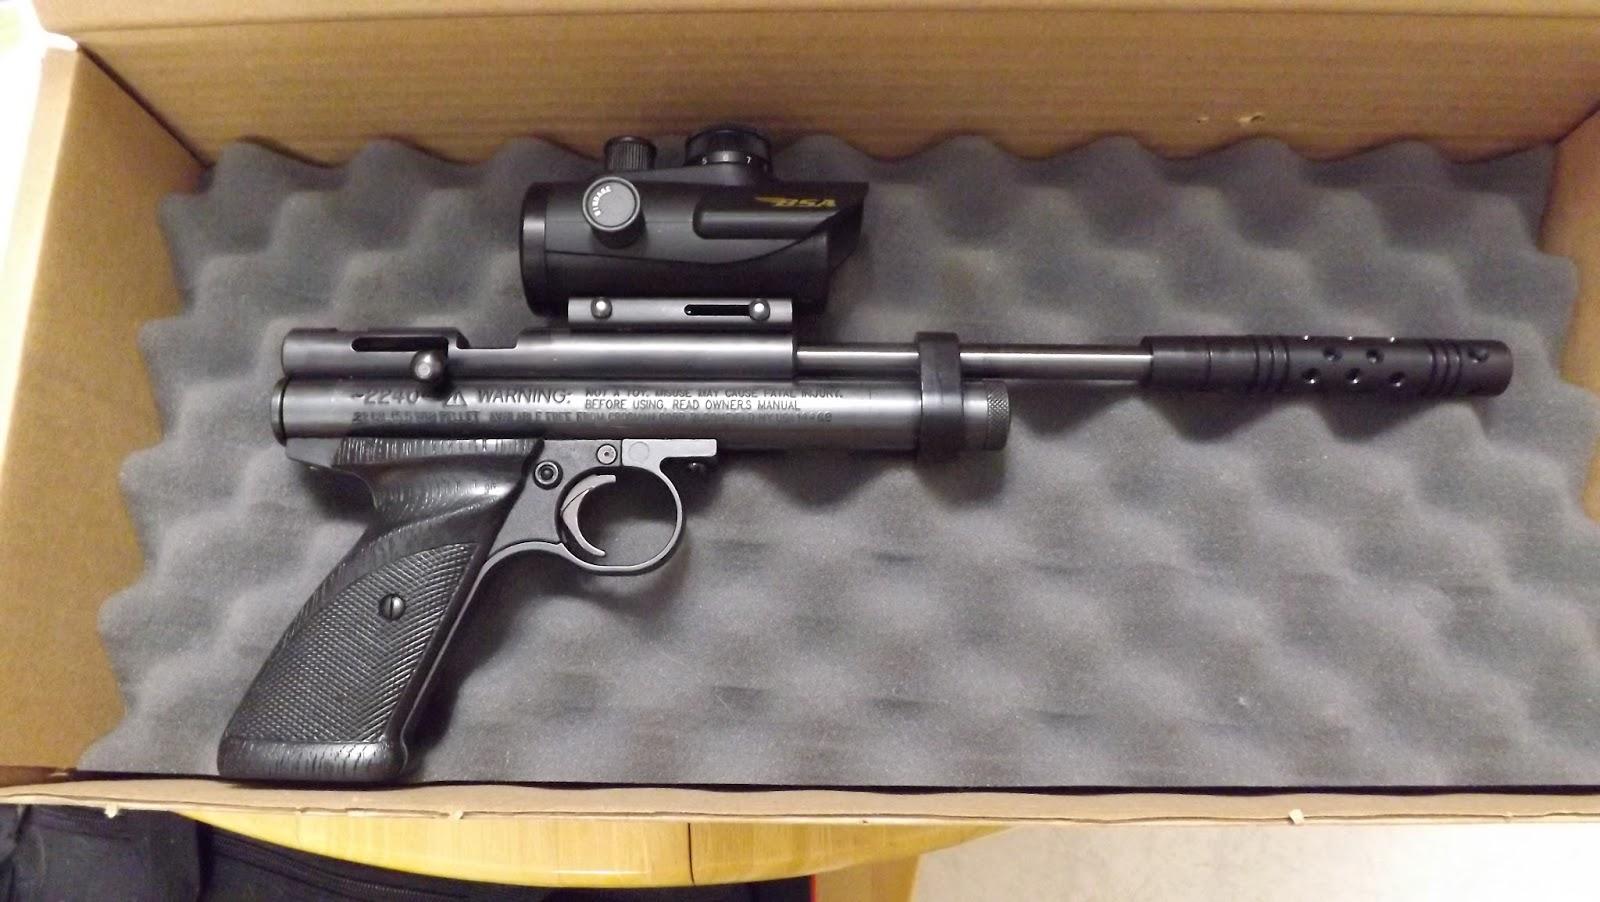 hugh s custom air guns crosman 2240 from basic to bad to the bone rh hughscustomairguns blogspot com Modified Crosman 2240 Crosman 2240 Mods